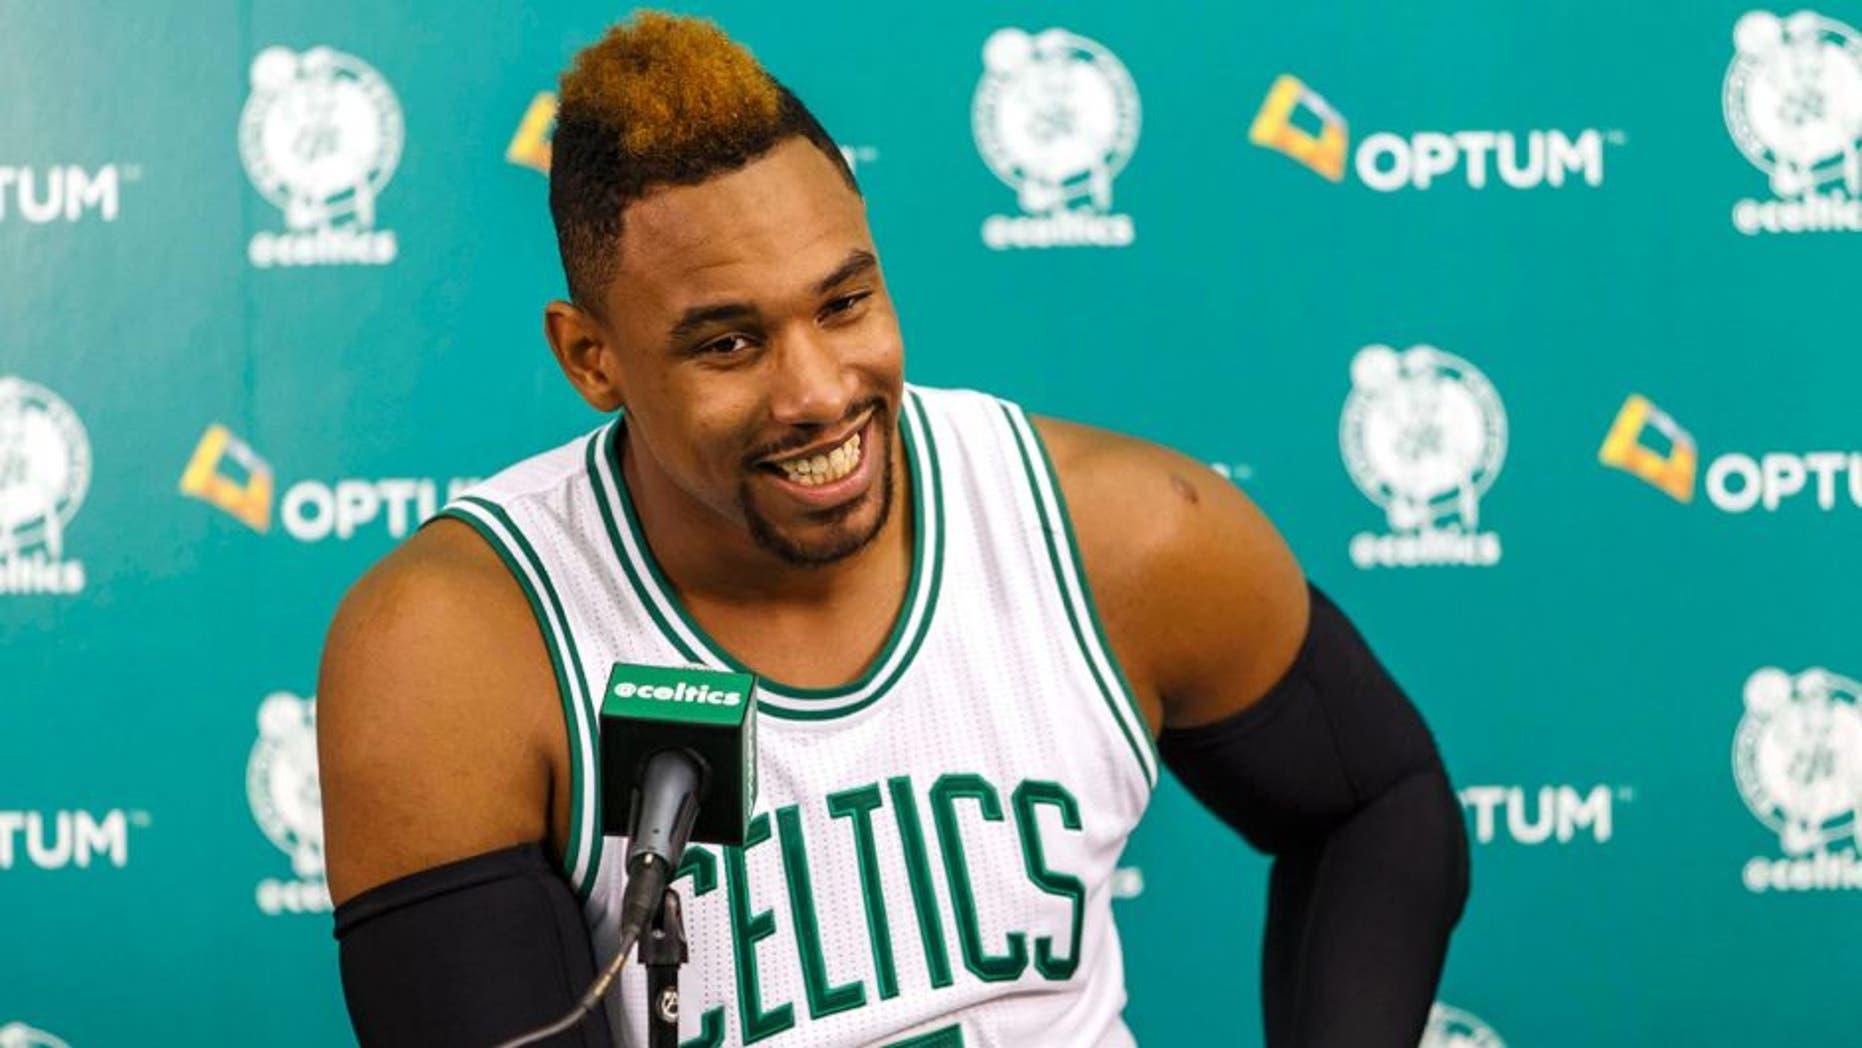 Sep 25, 2015; Waltham, MA, USA; Boston Celtics forward Jared Sullinger (7) during media day at the Boston Celtic Practice Facility. Mandatory Credit: David Butler II-USA TODAY Sports